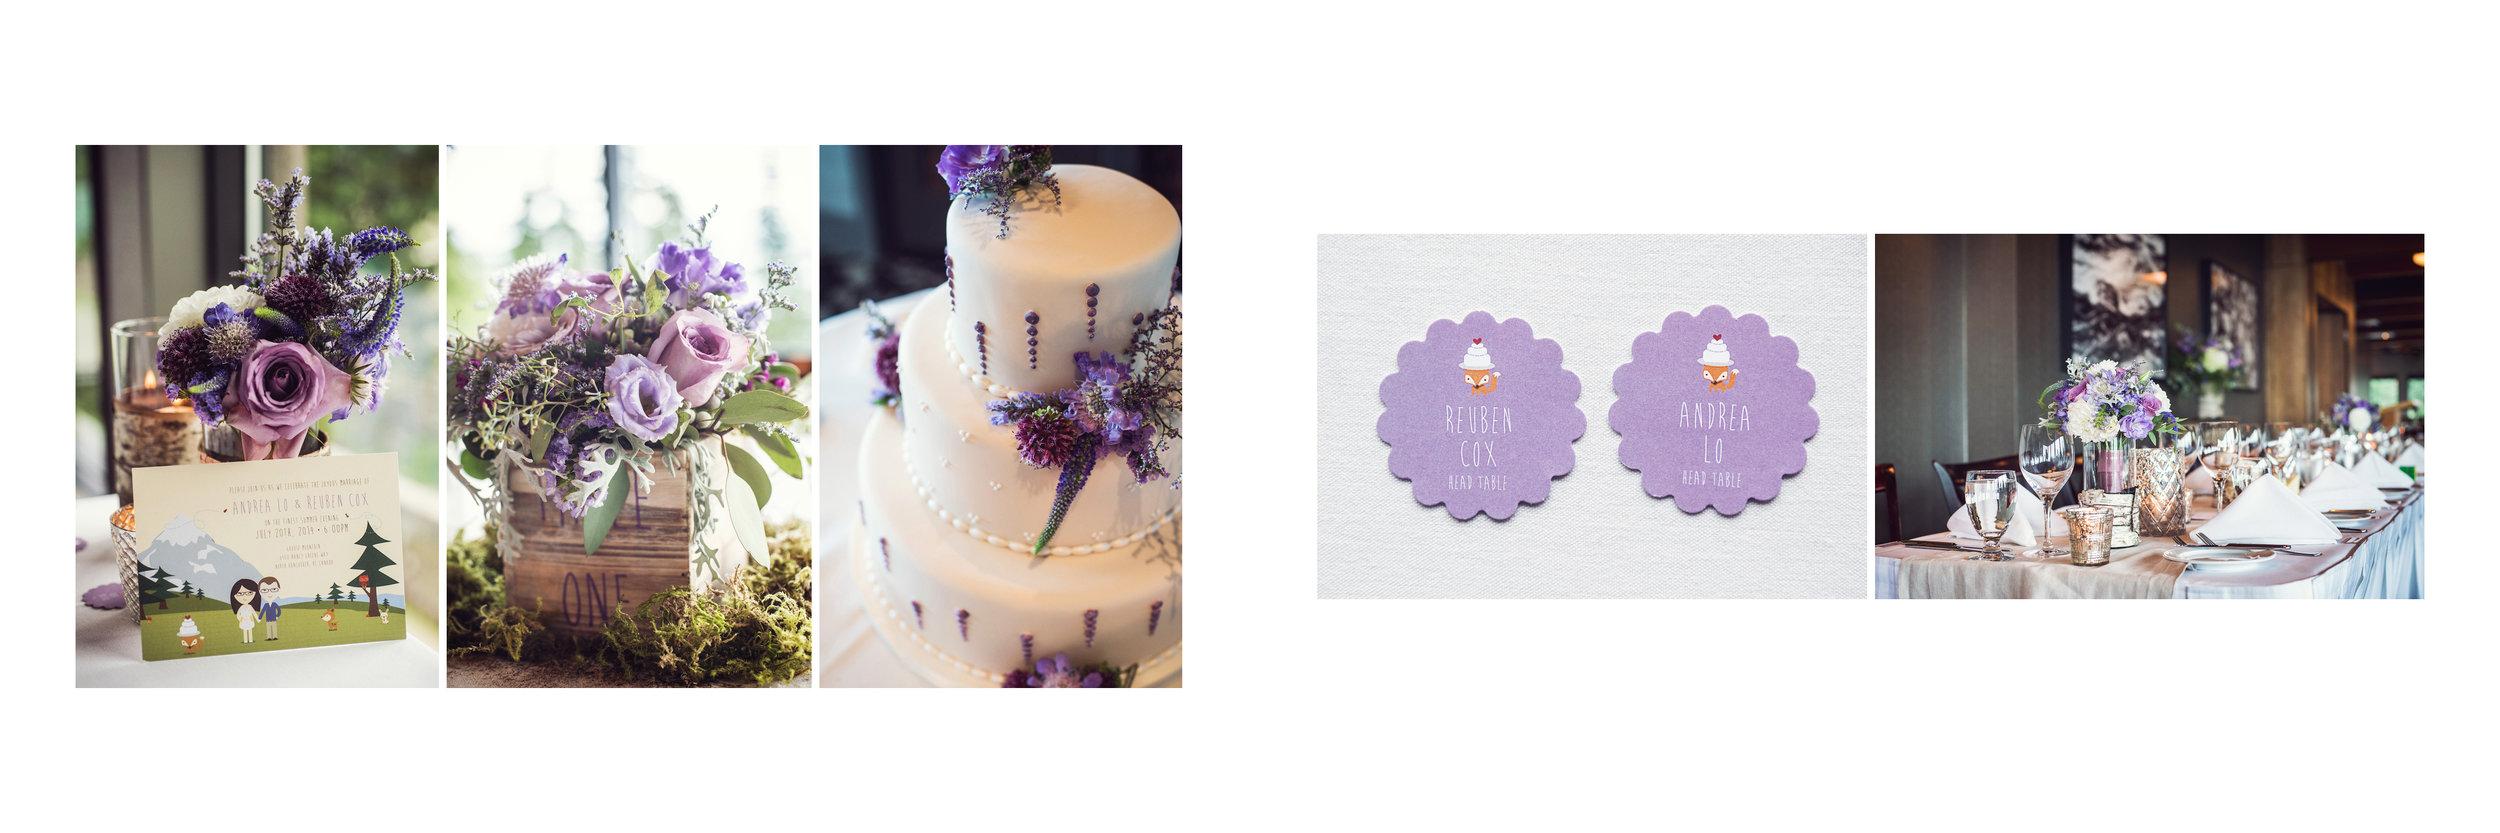 Andrea-Reuben-Grouse-Mountain-Wedding-Real-Weddings-Feature-Yaletown-Photography-013.jpg